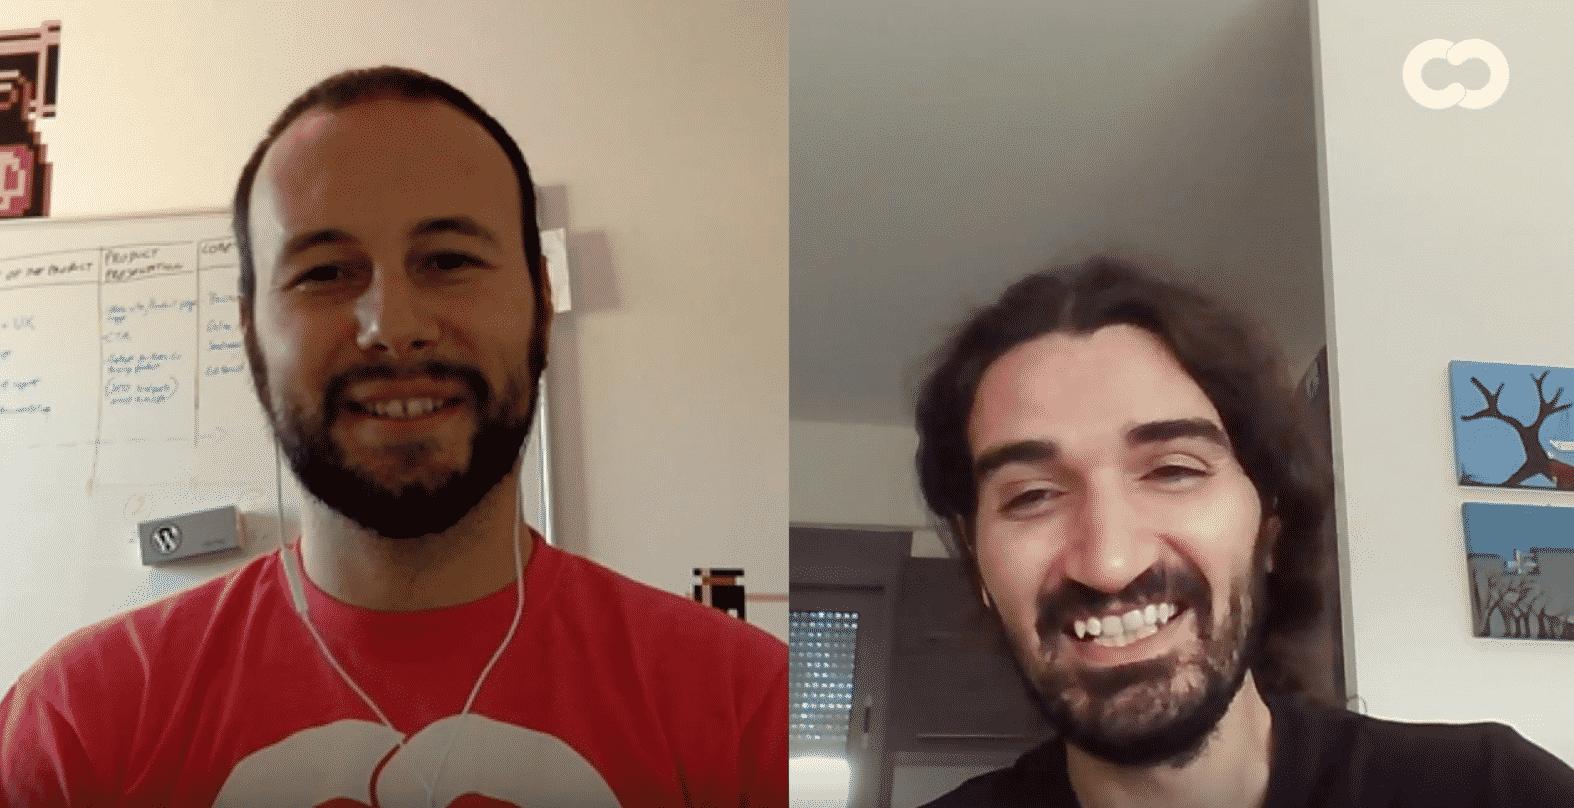 Talking with Spyros Vlachopoulos, form NitroWeb